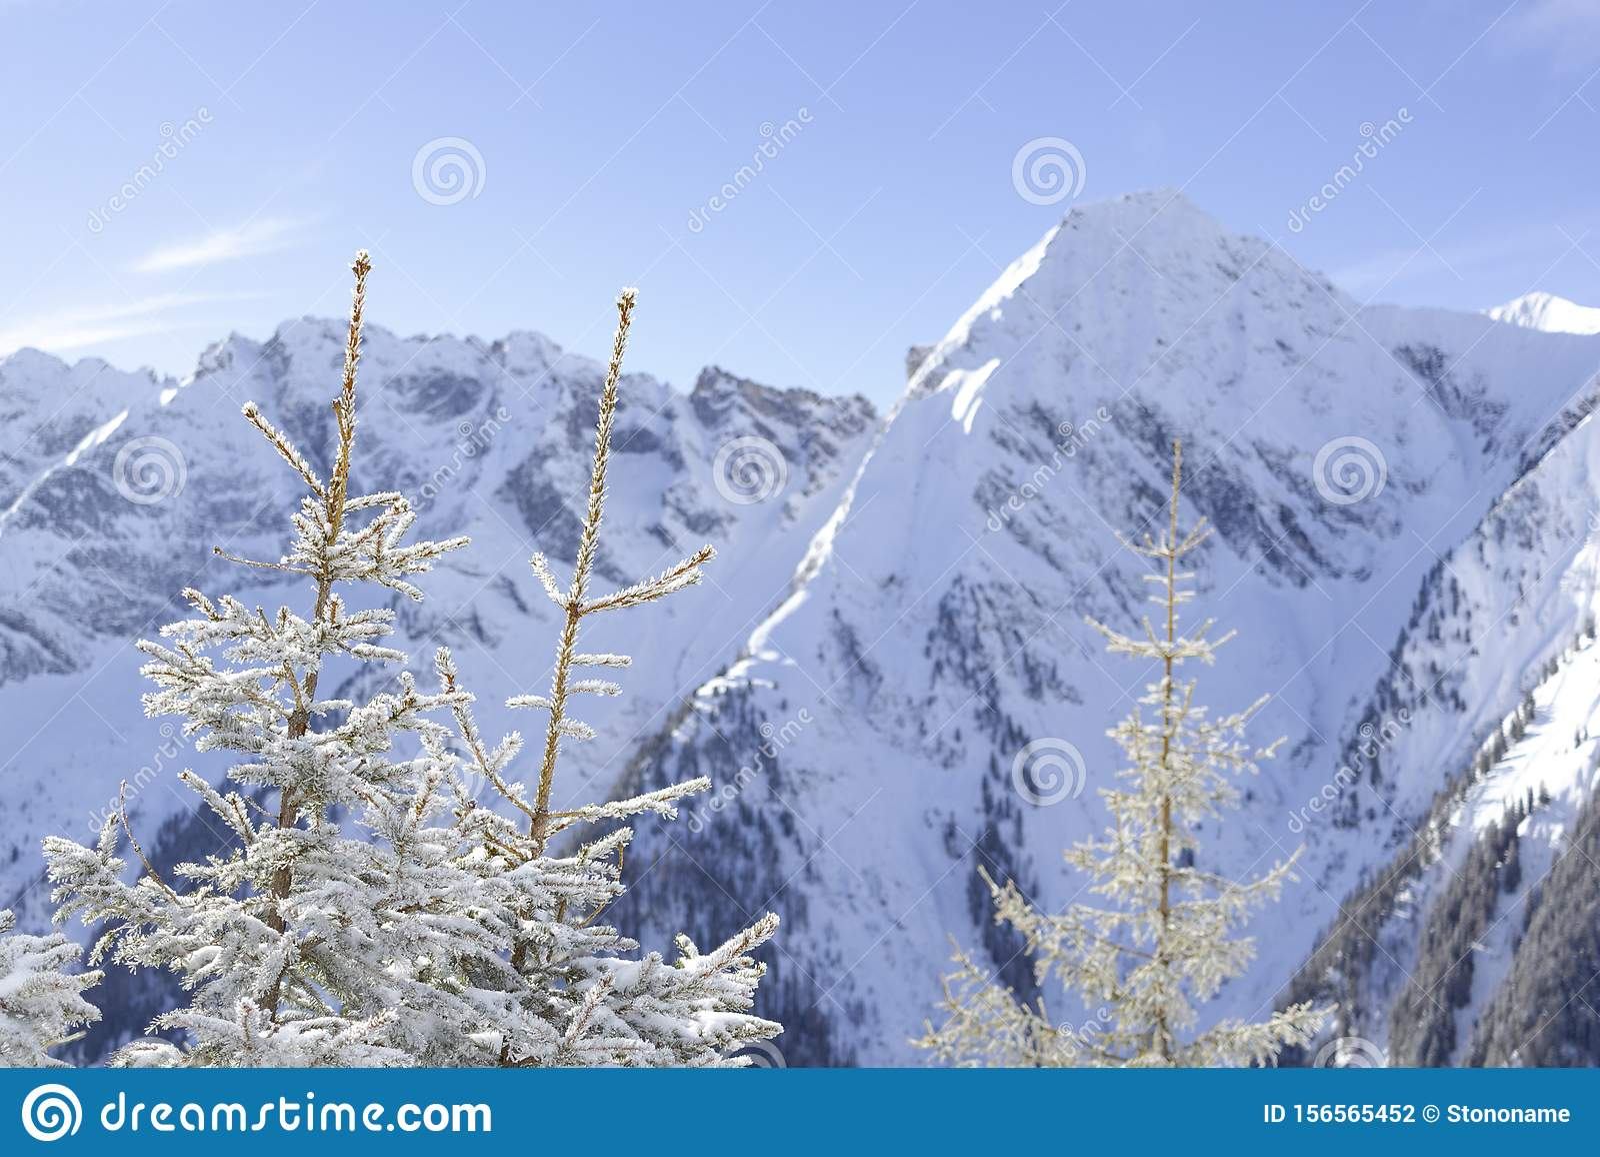 Austrian Alps in winter.Alpine Alps mountain landscape at Tirol, Top of Europe